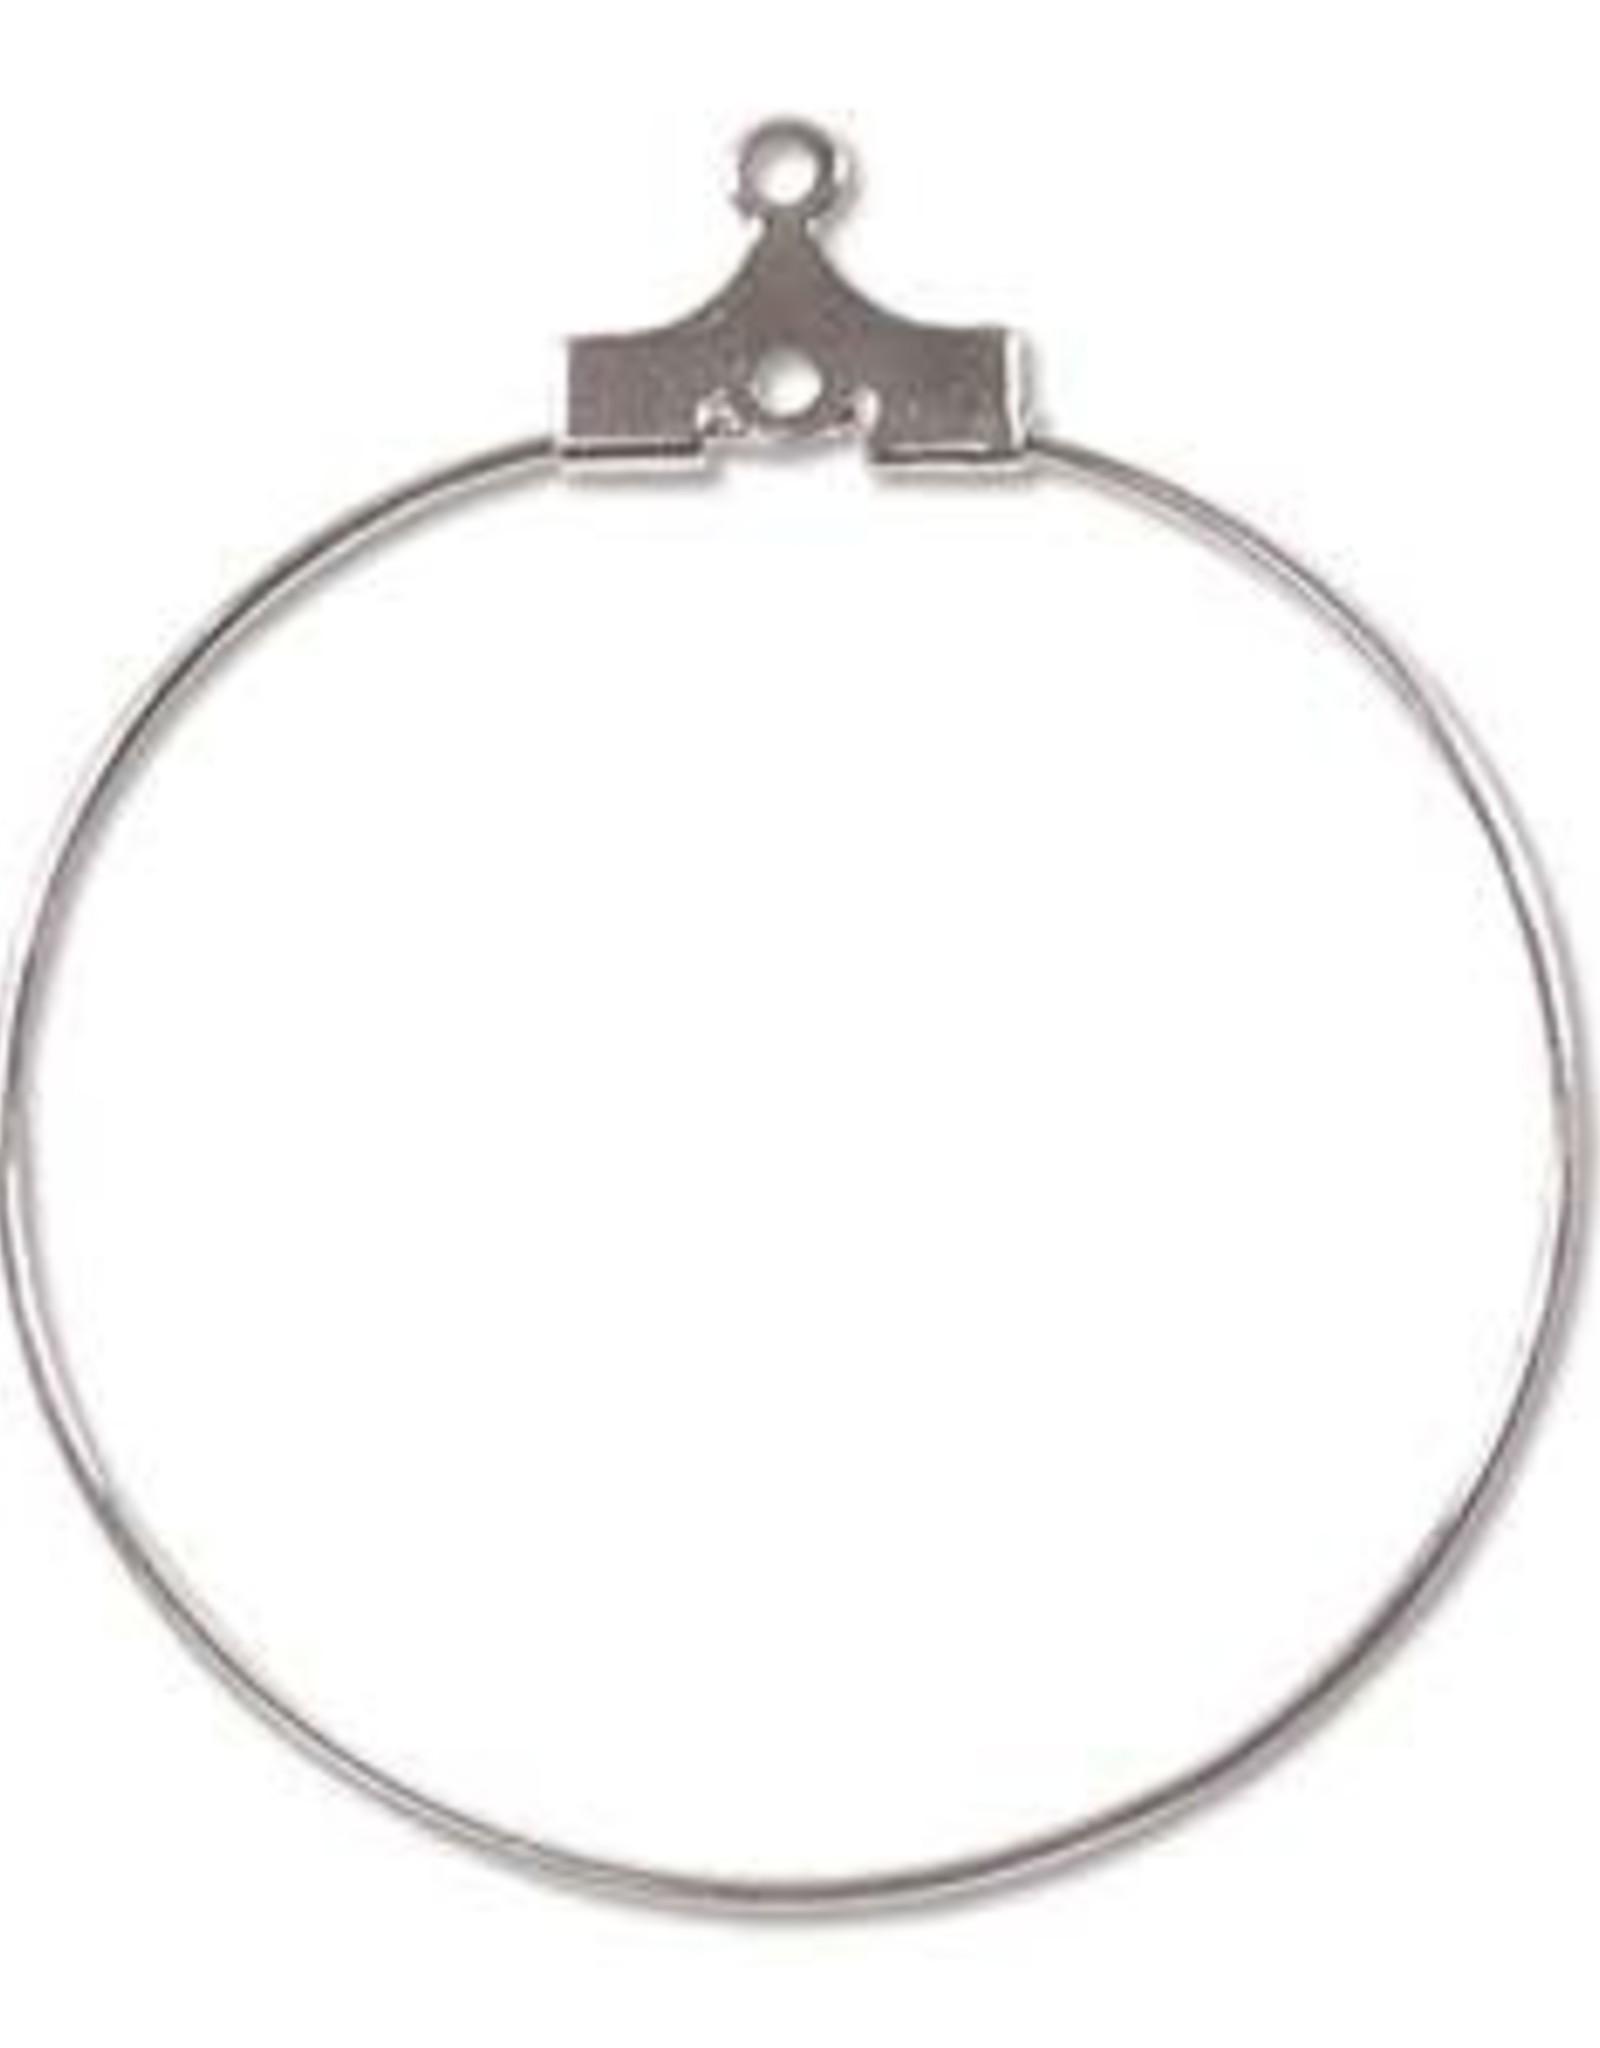 30mm Bead Hoop Silver Plate Qty 12